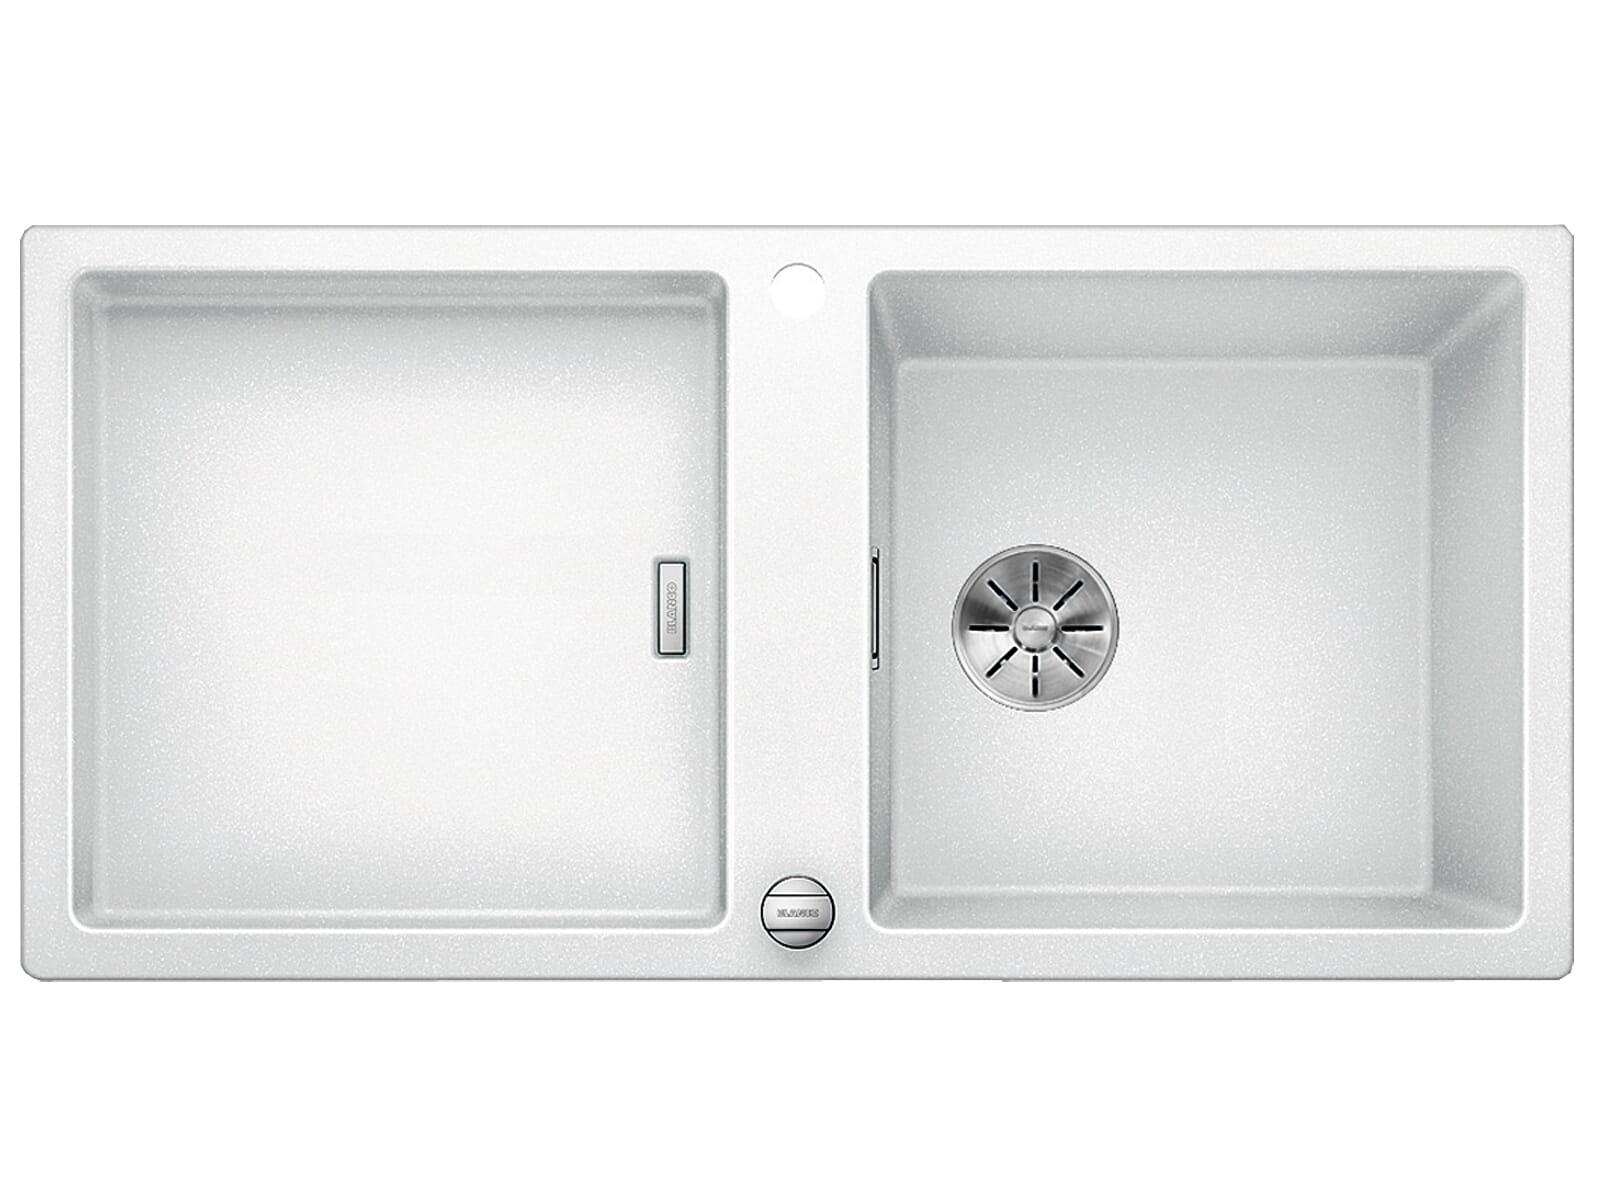 Blanco Adon XL 6 S Weiß - 523 608 Granitspüle